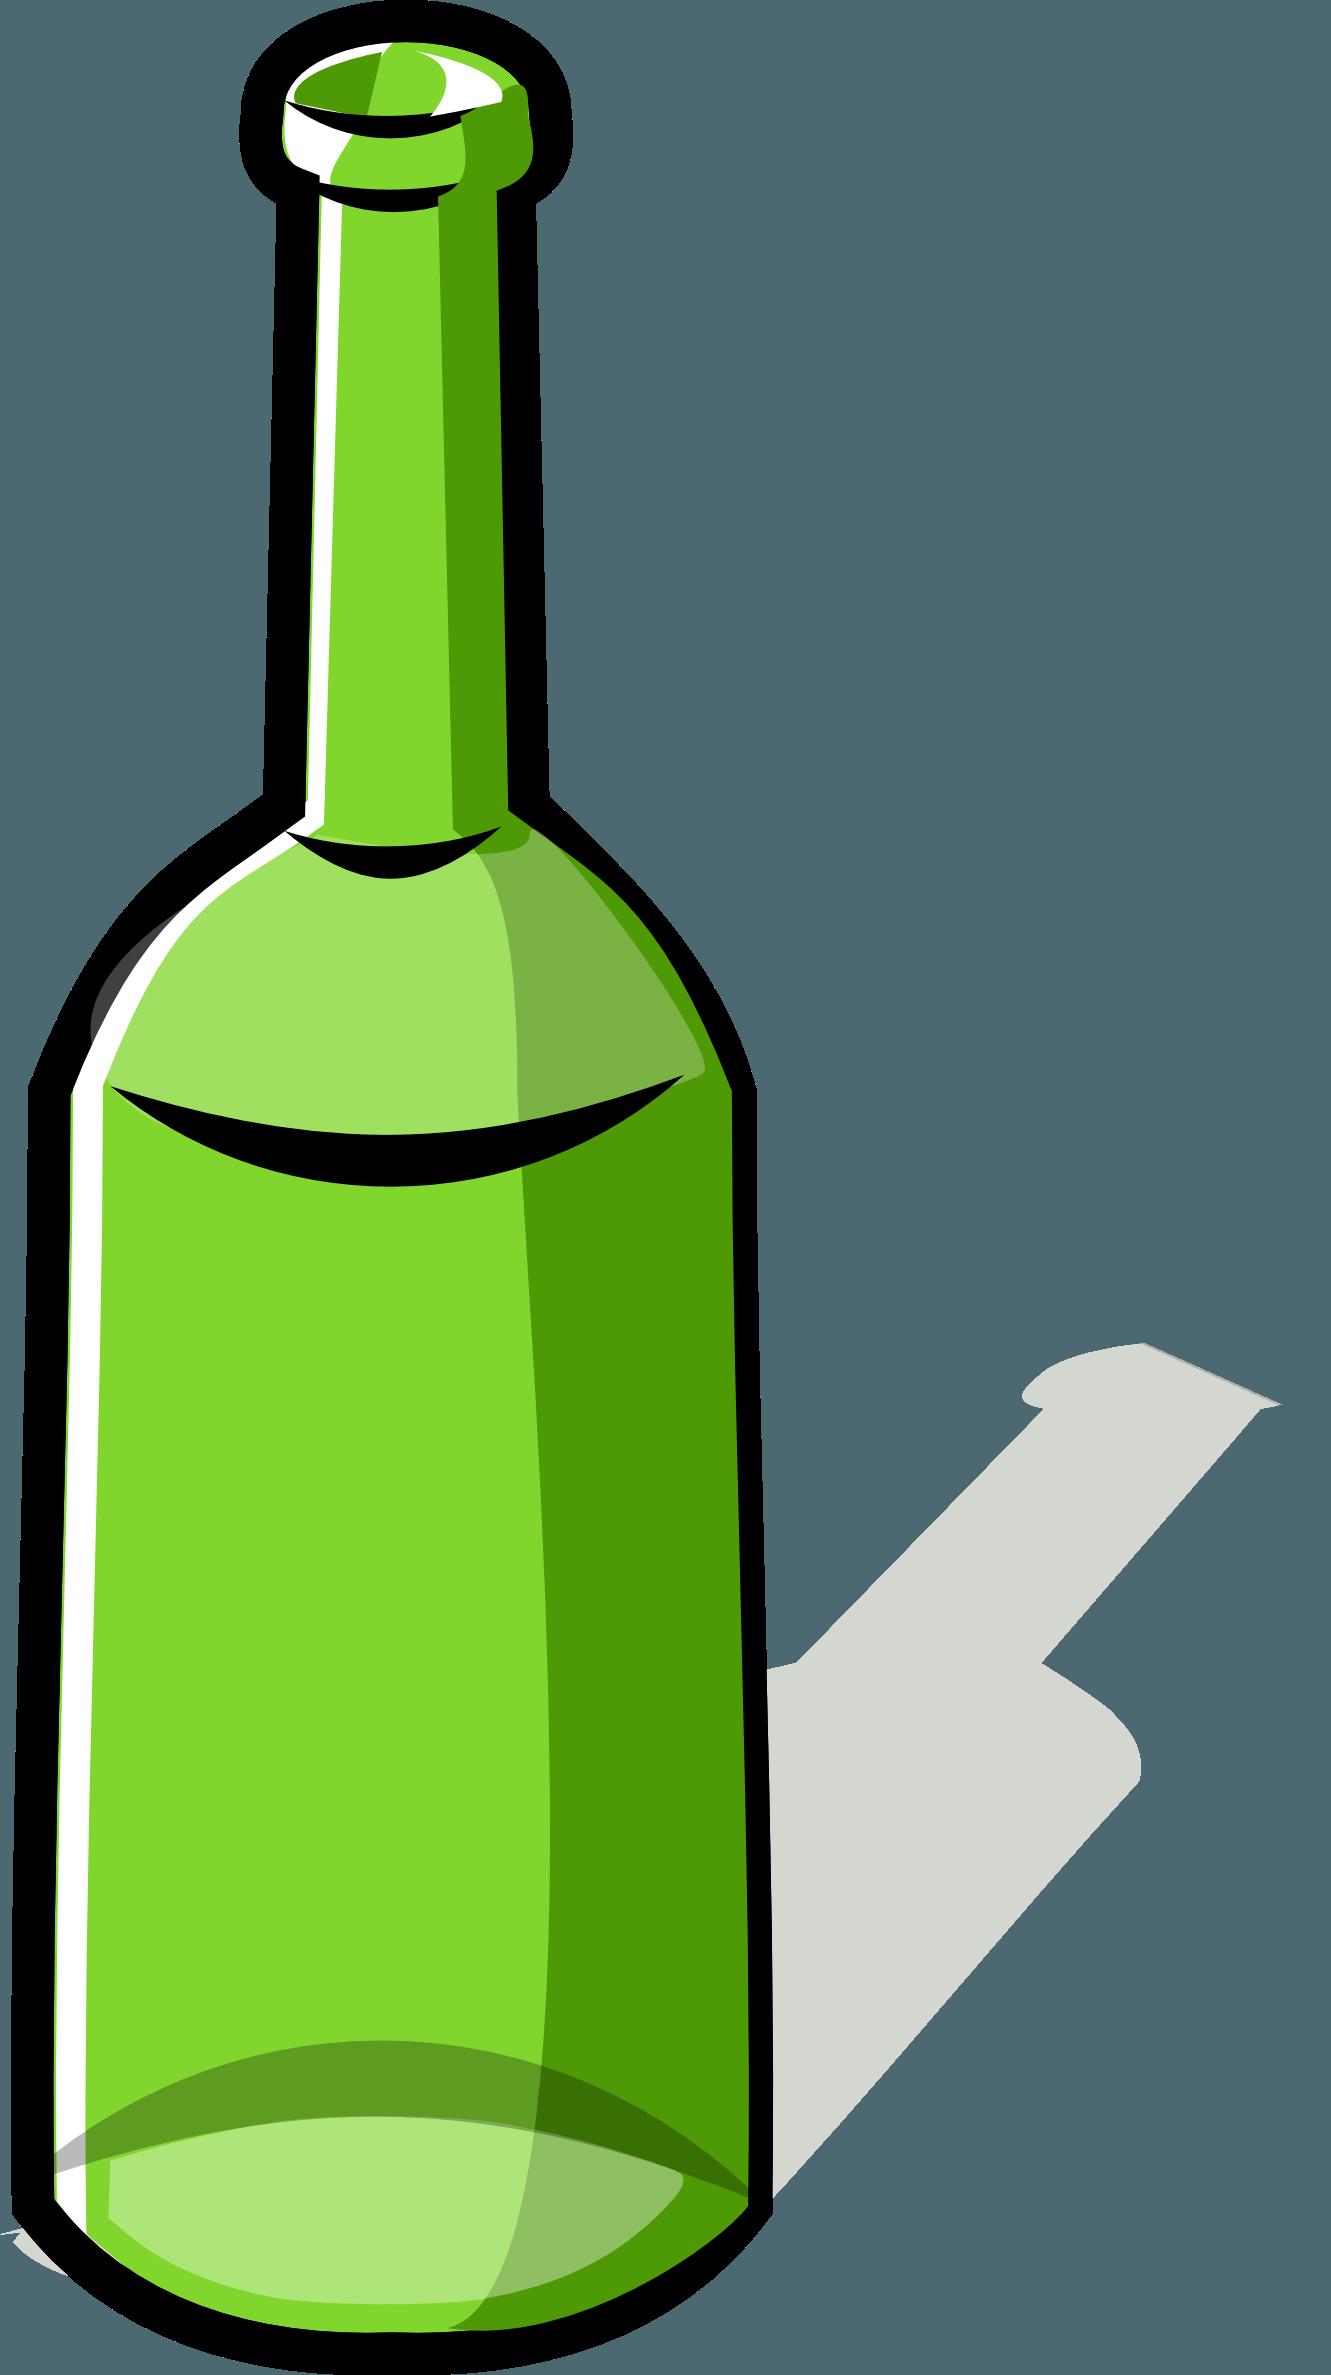 Bottle png. Download image of hq